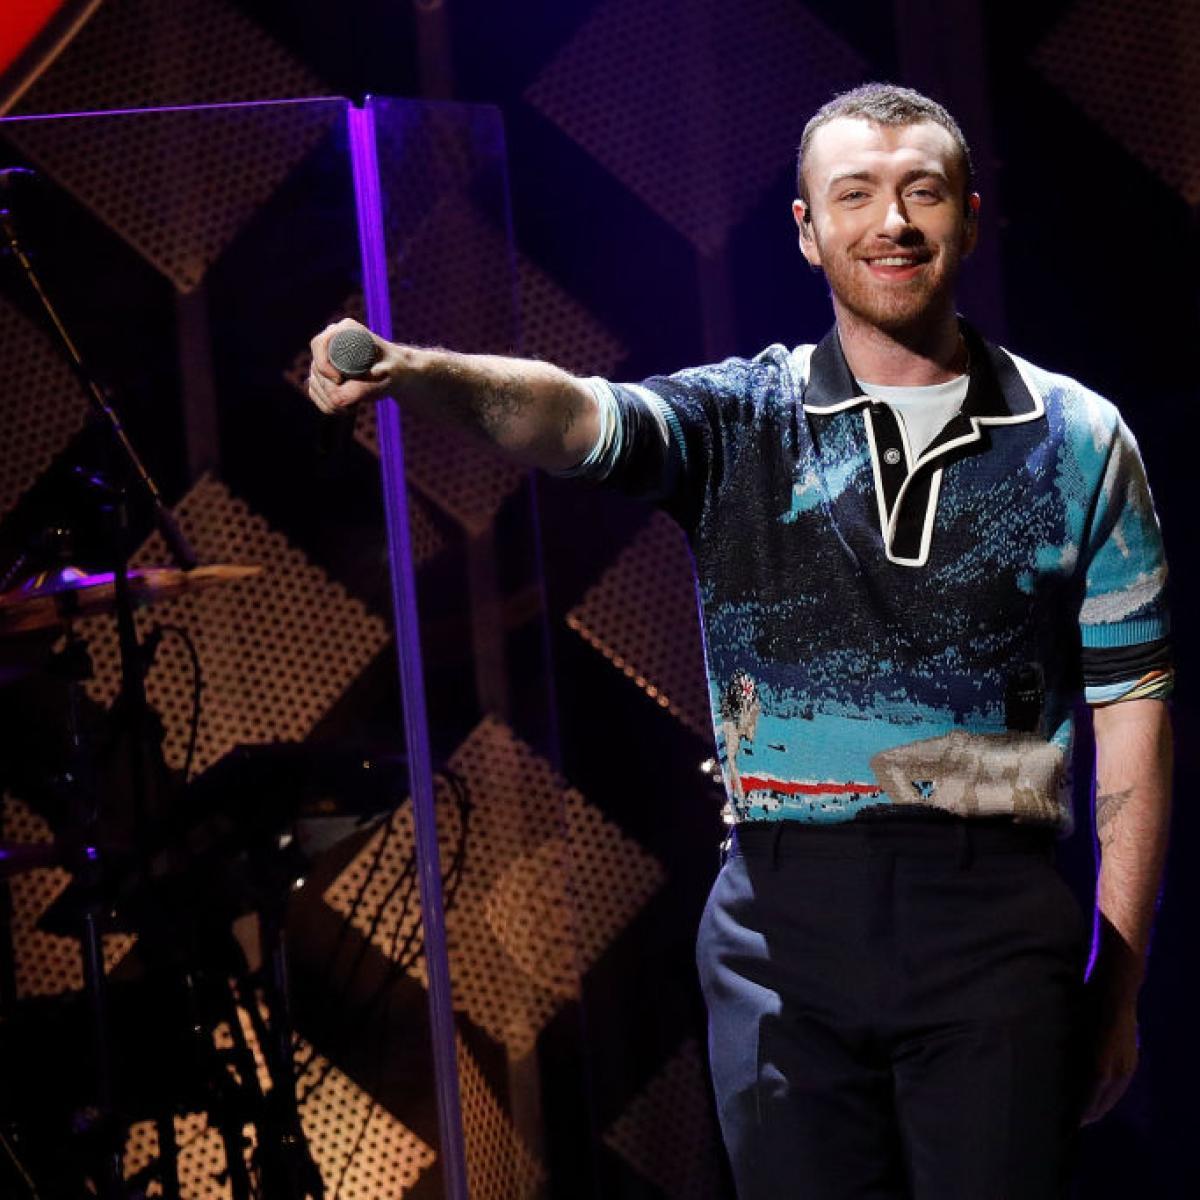 Sam Smith Cancels iHeartRadio Music Festival Performance